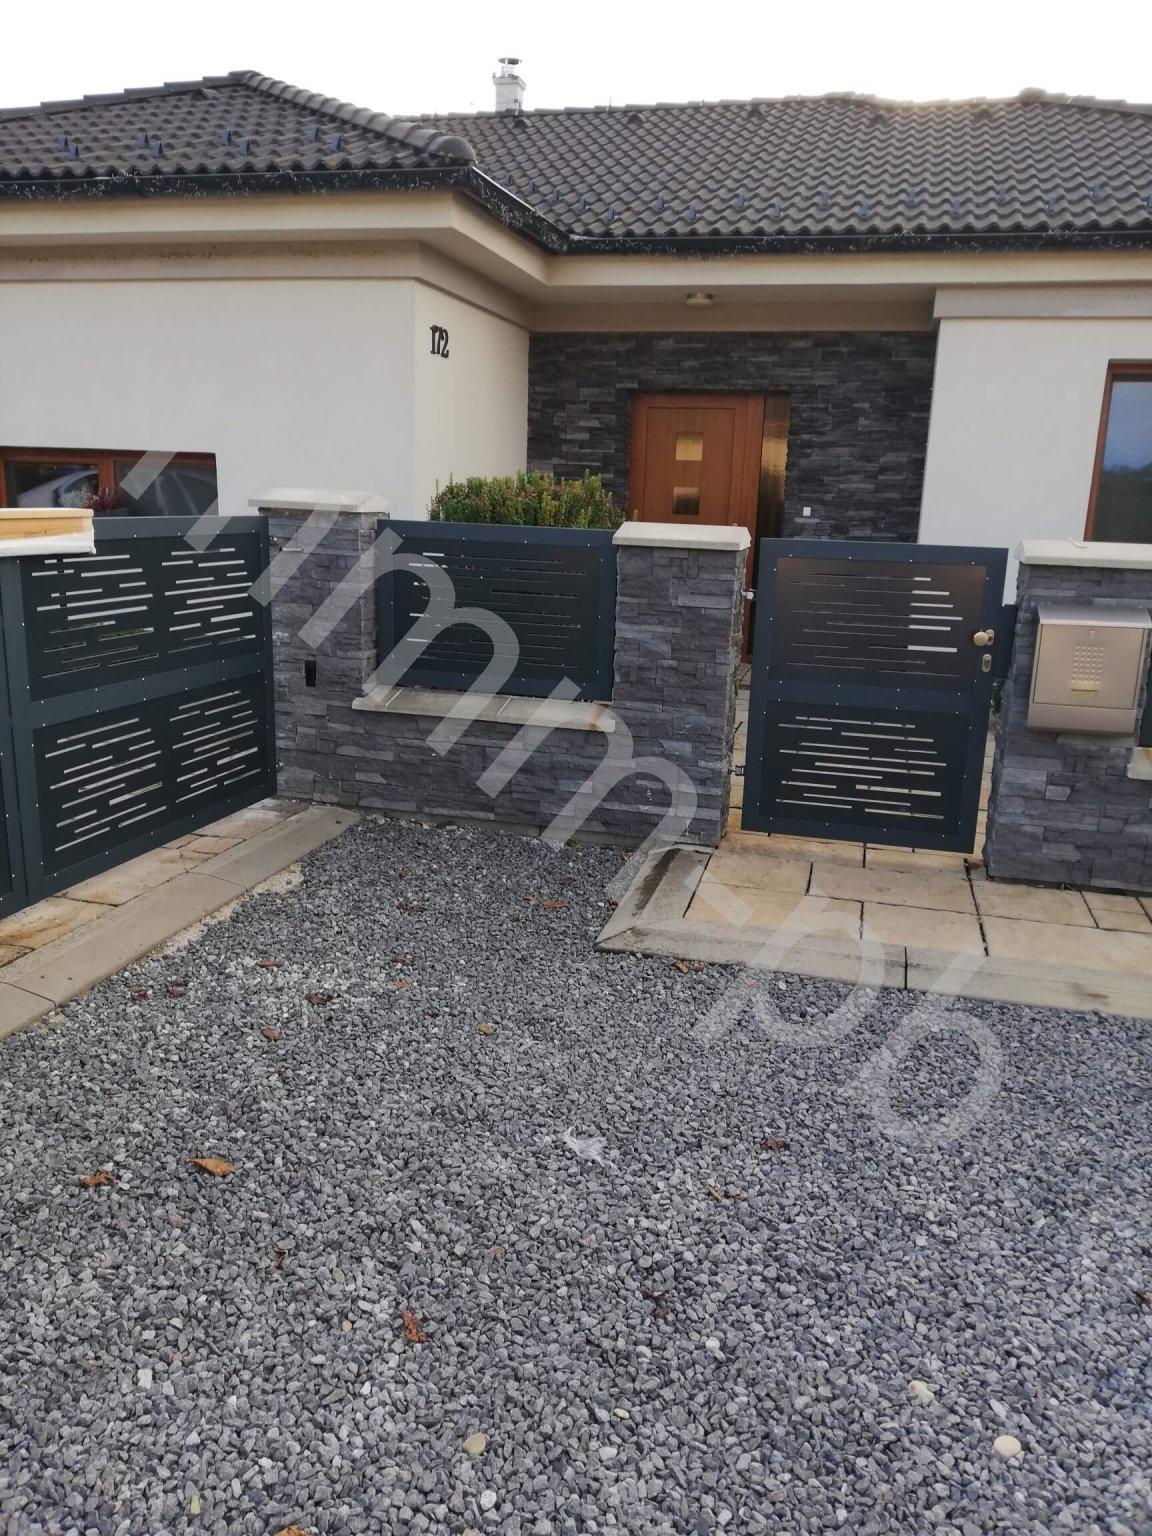 dizajnov vplne plotov a bran 7 2 1152x1536